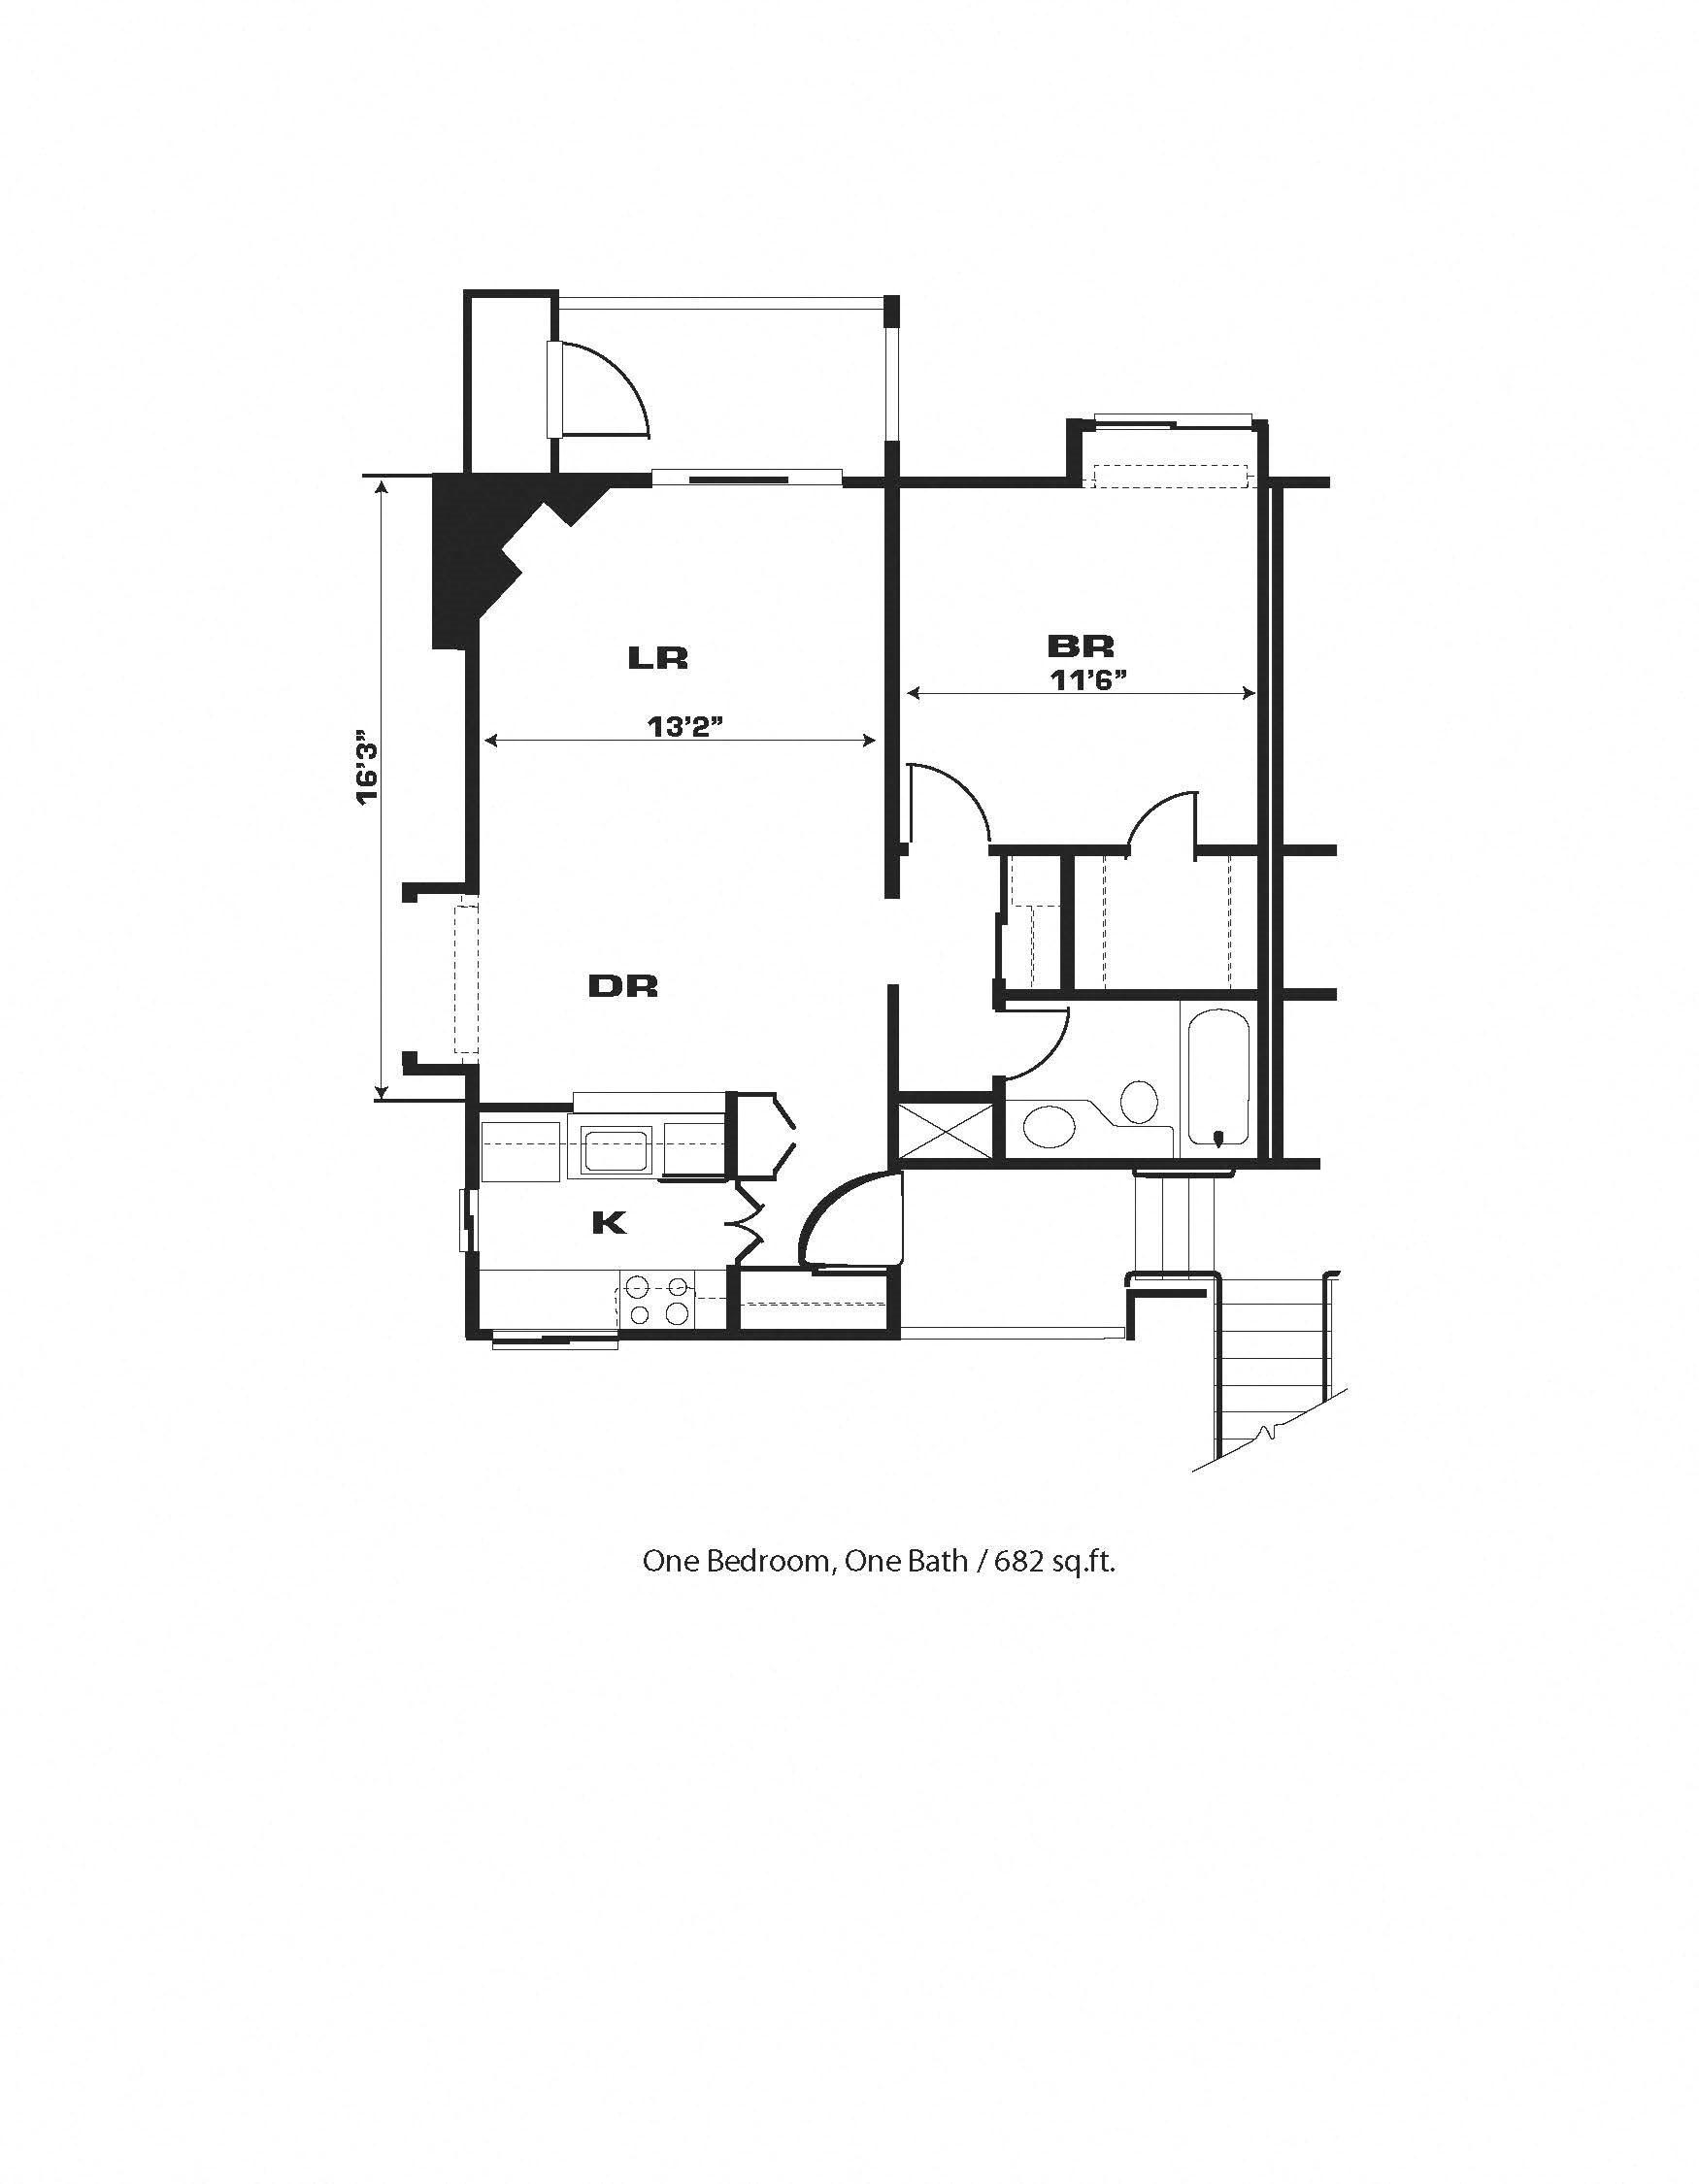 1br/1ba, Fireplace, End Unit Floor Plan 6